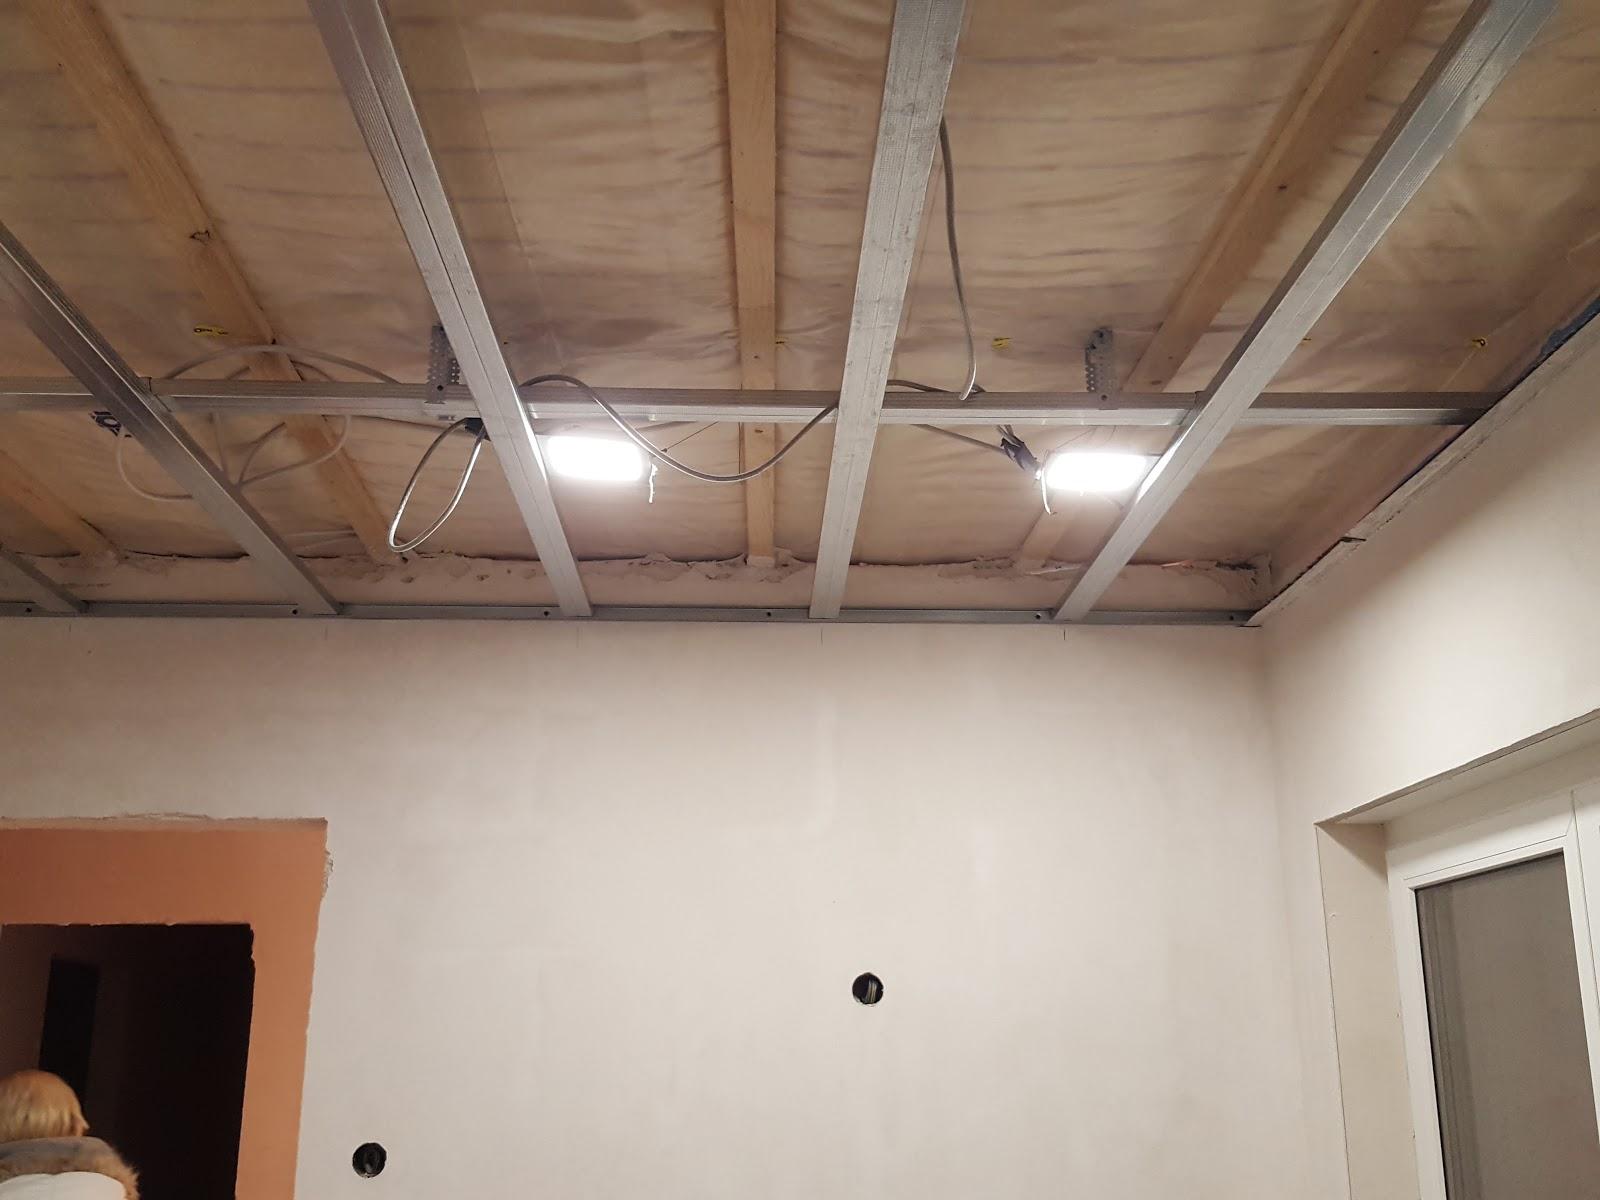 Top Hausbau-Nickern Blog: Verkabelung LED-Beleuchtung Bad DW13